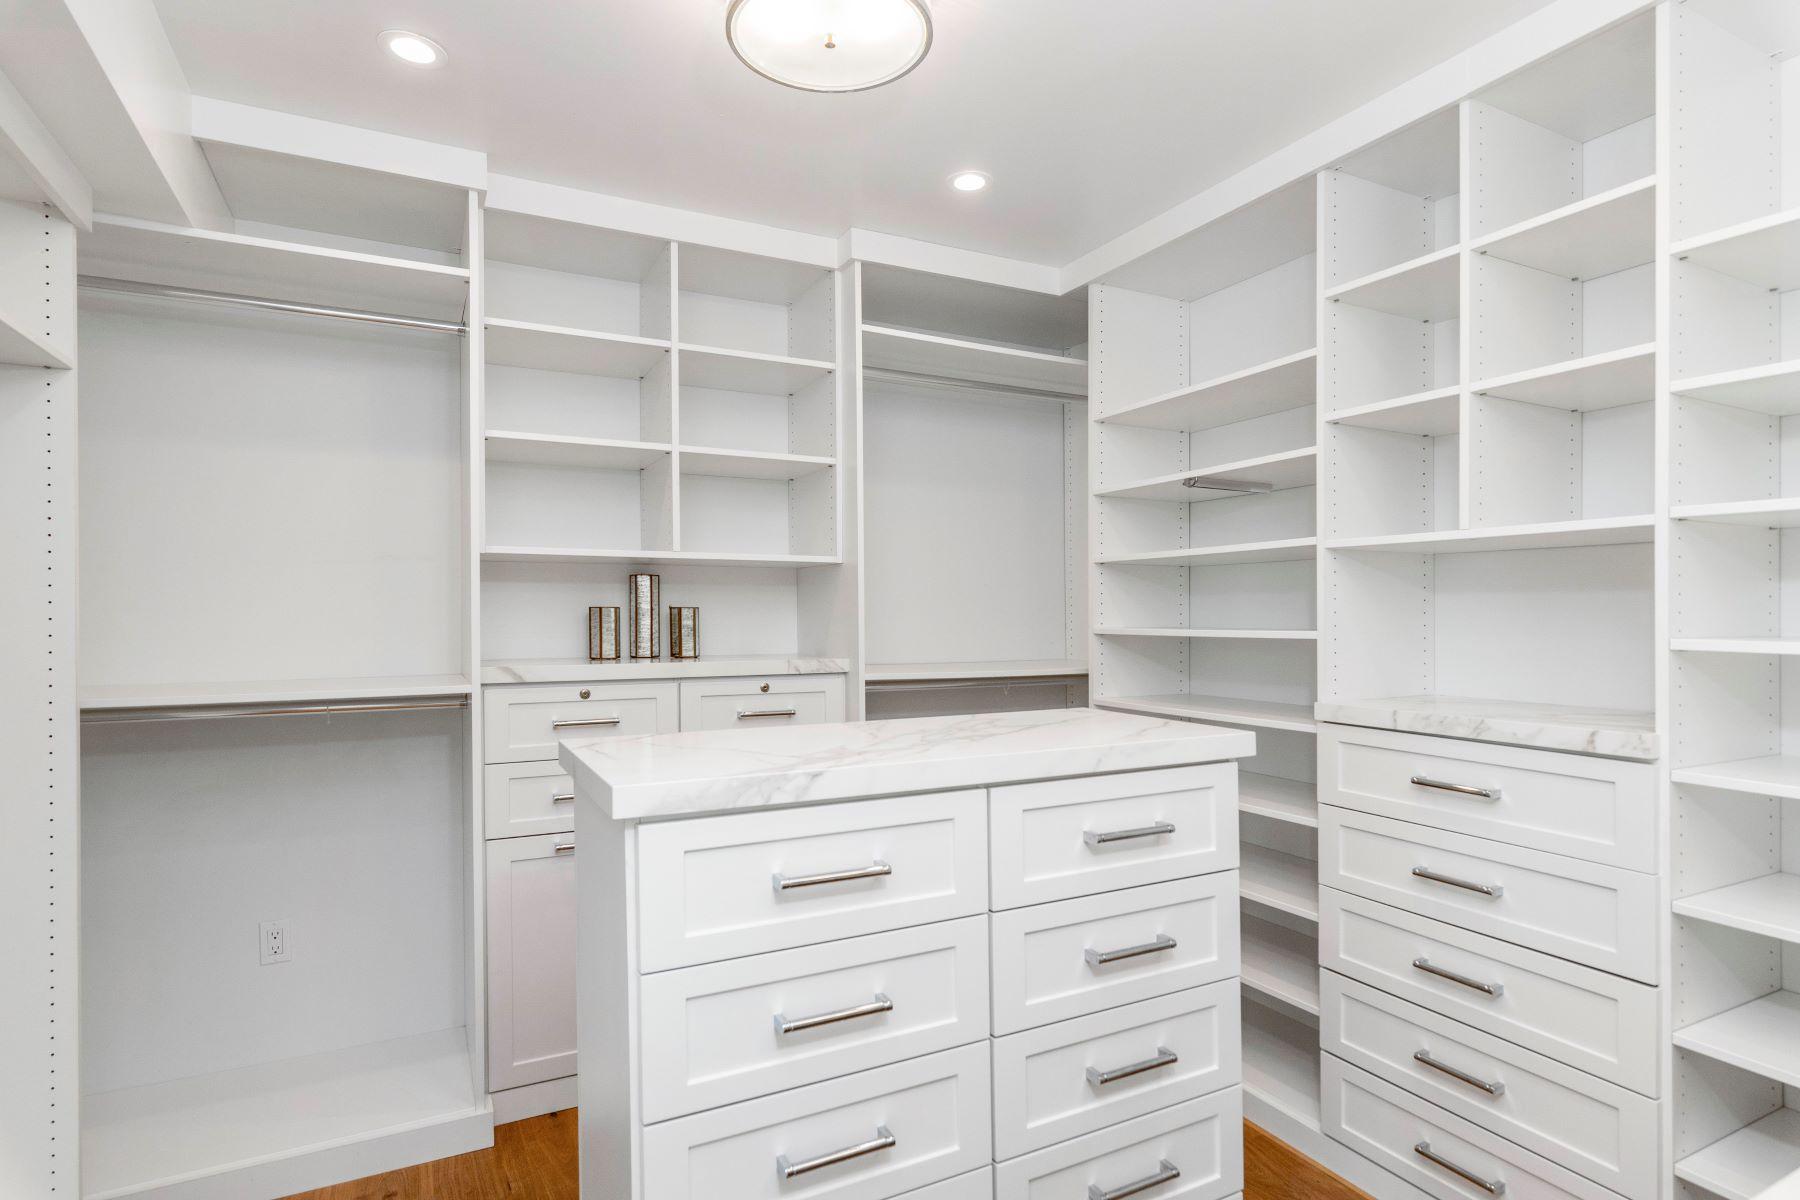 Additional photo for property listing at 1215 Fisher Avenue, Manhattan Beach, CA 90266 1215 Fisher Avenue Manhattan Beach, California 90266 Estados Unidos